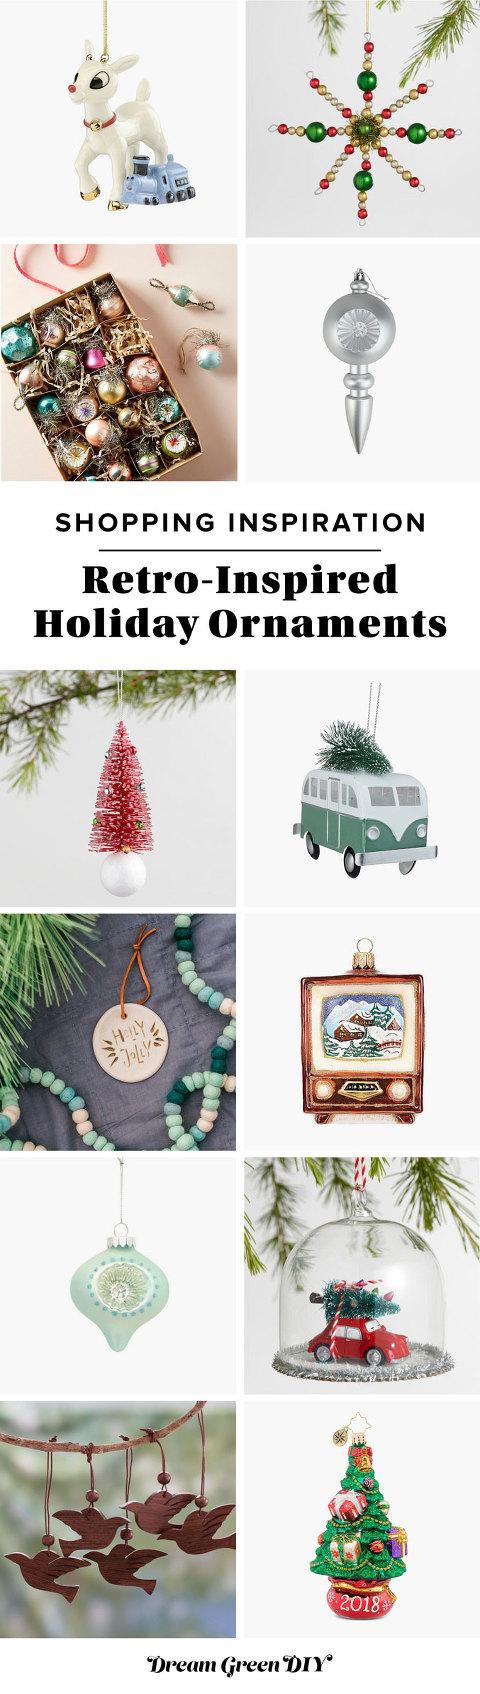 Retro-Inspired Christmas Ornaments